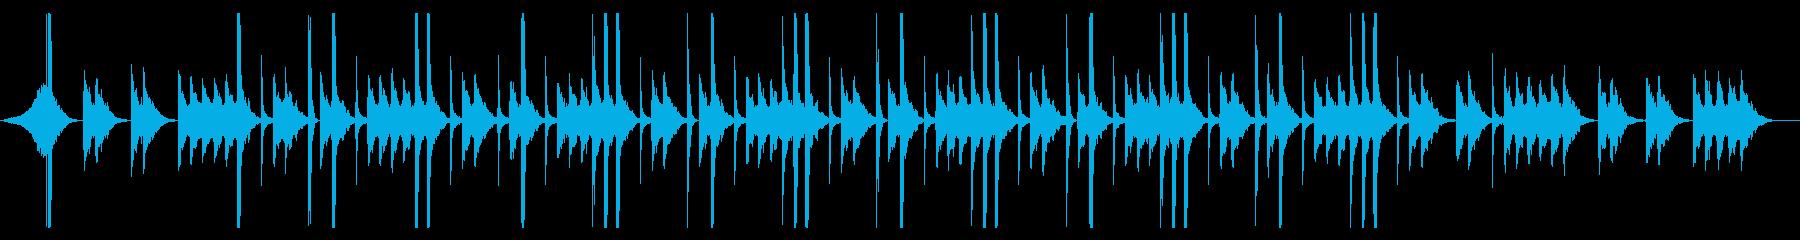 Pluck!!のオフボーカル版の再生済みの波形